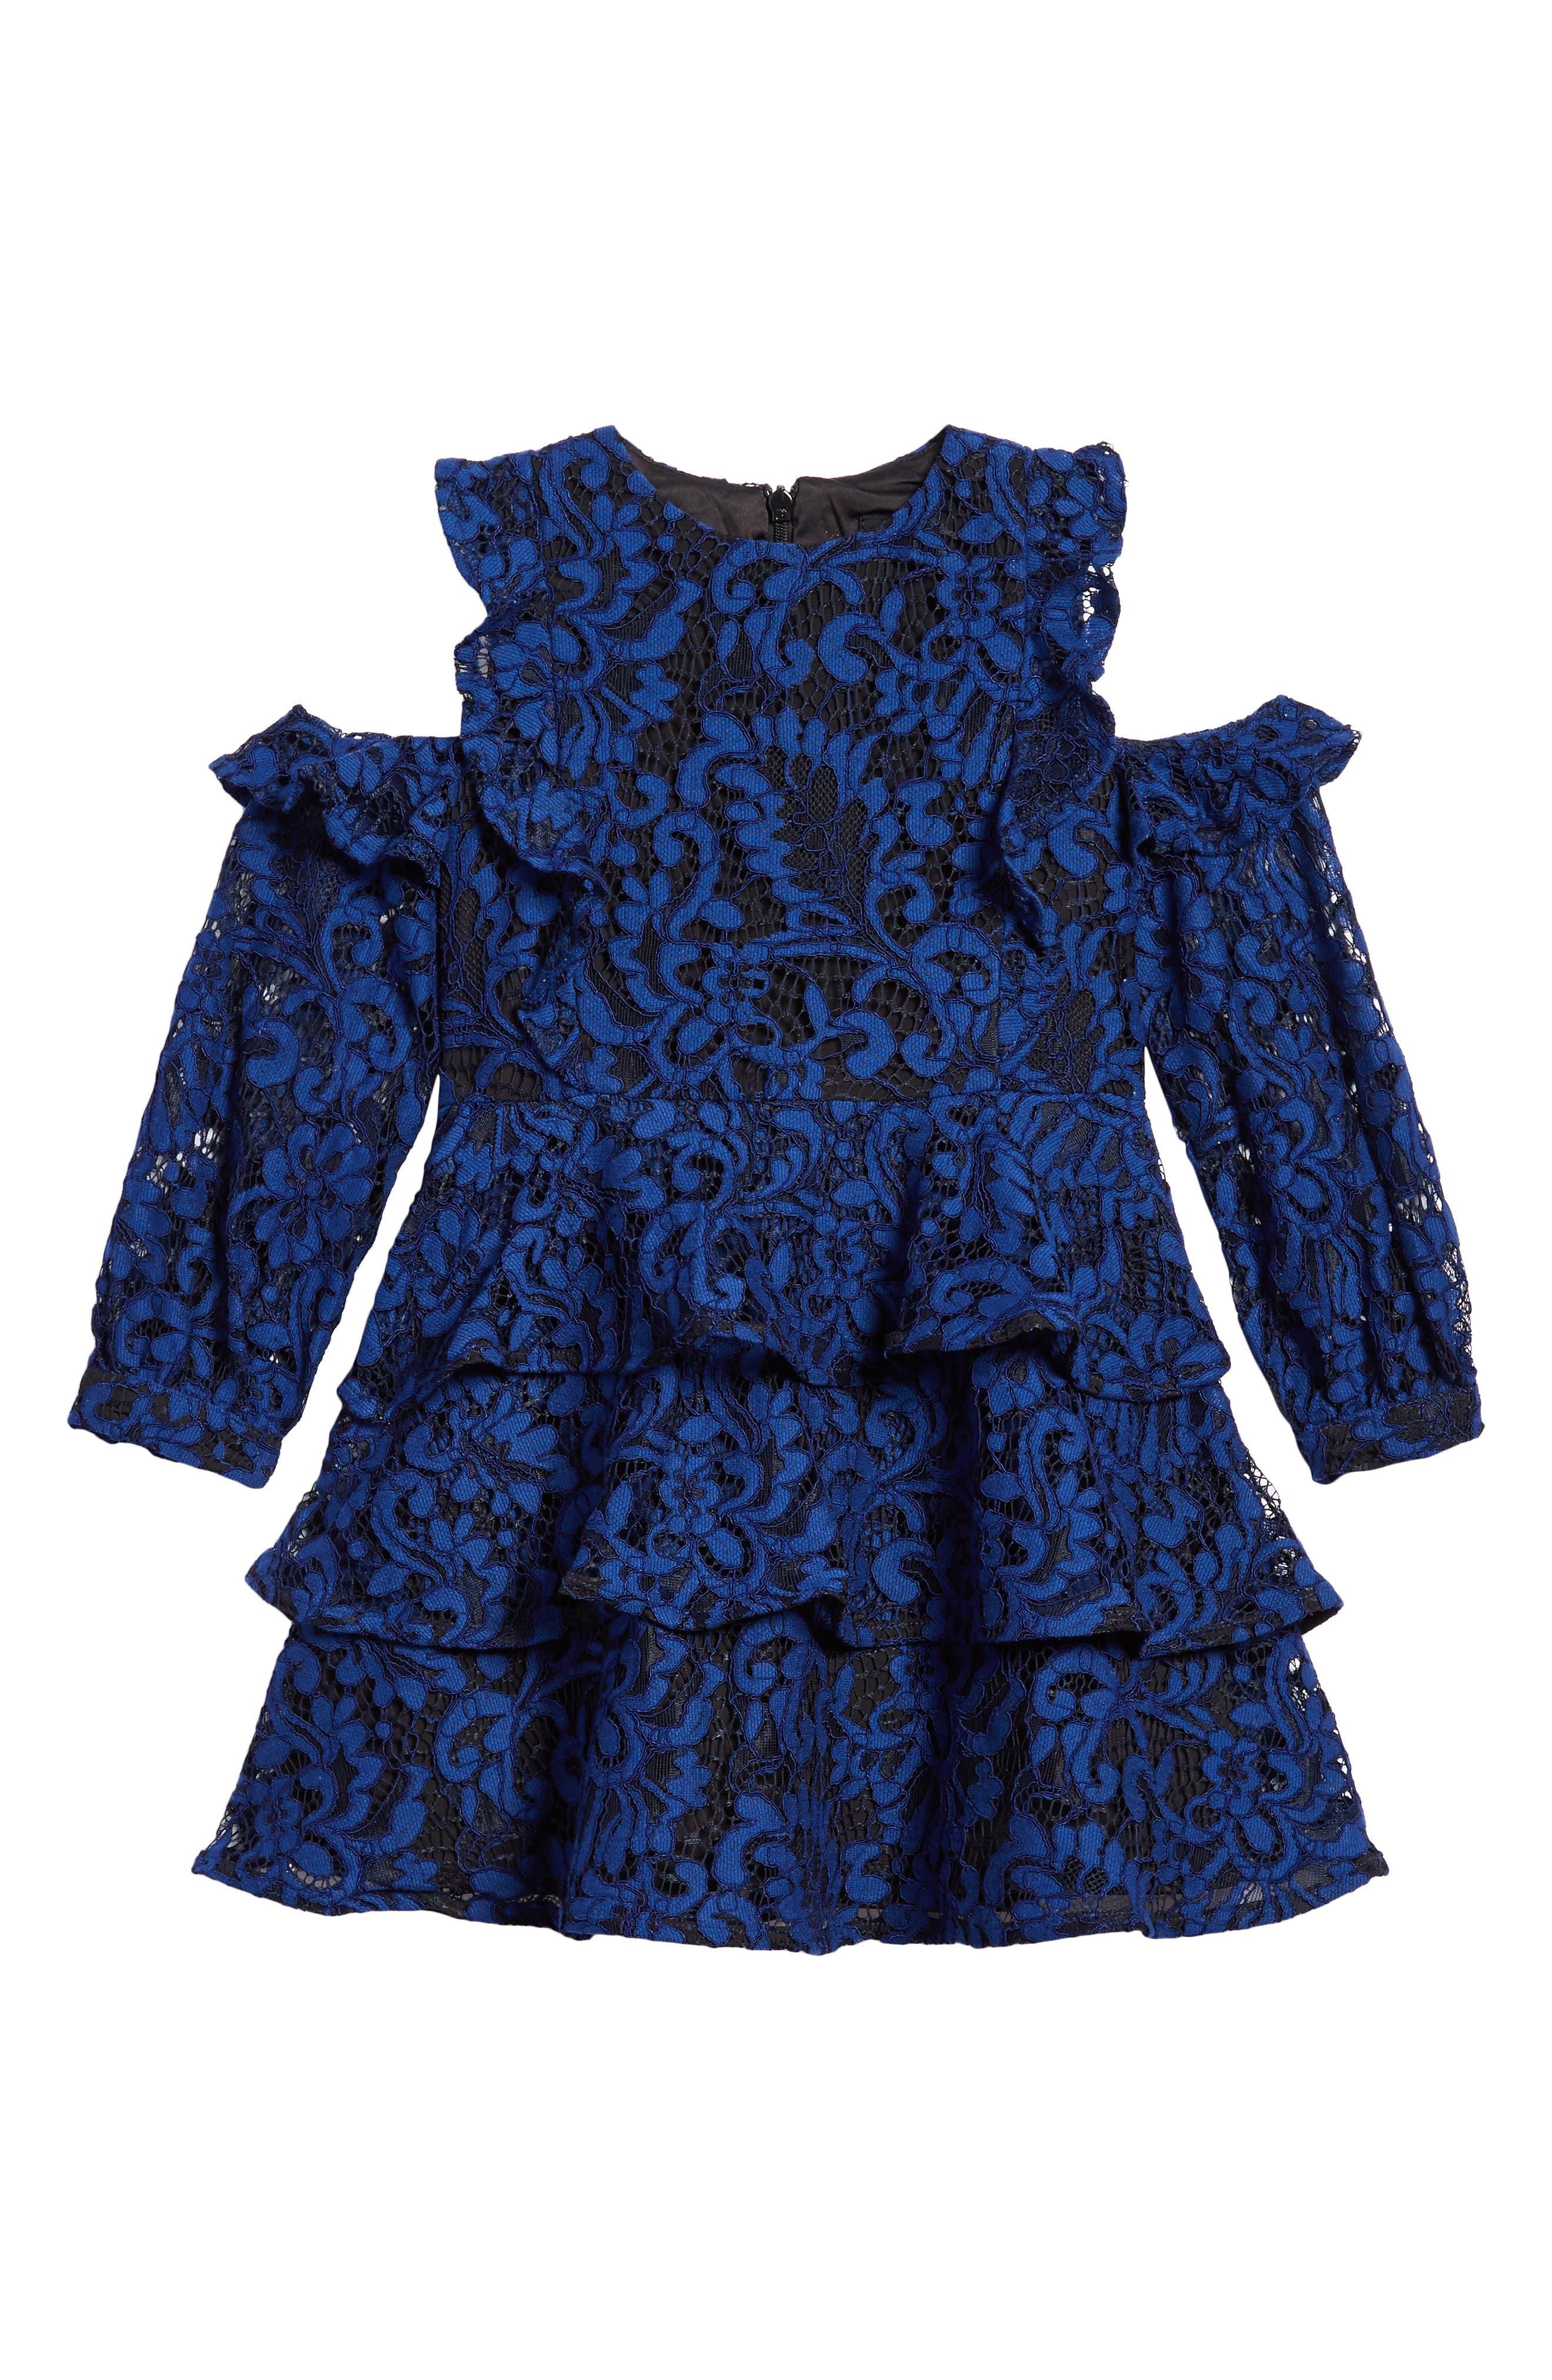 Alternate Image 1 Selected - Bardot Junior Ruffle Lace Cold Shoulder Dress (Little Girls)